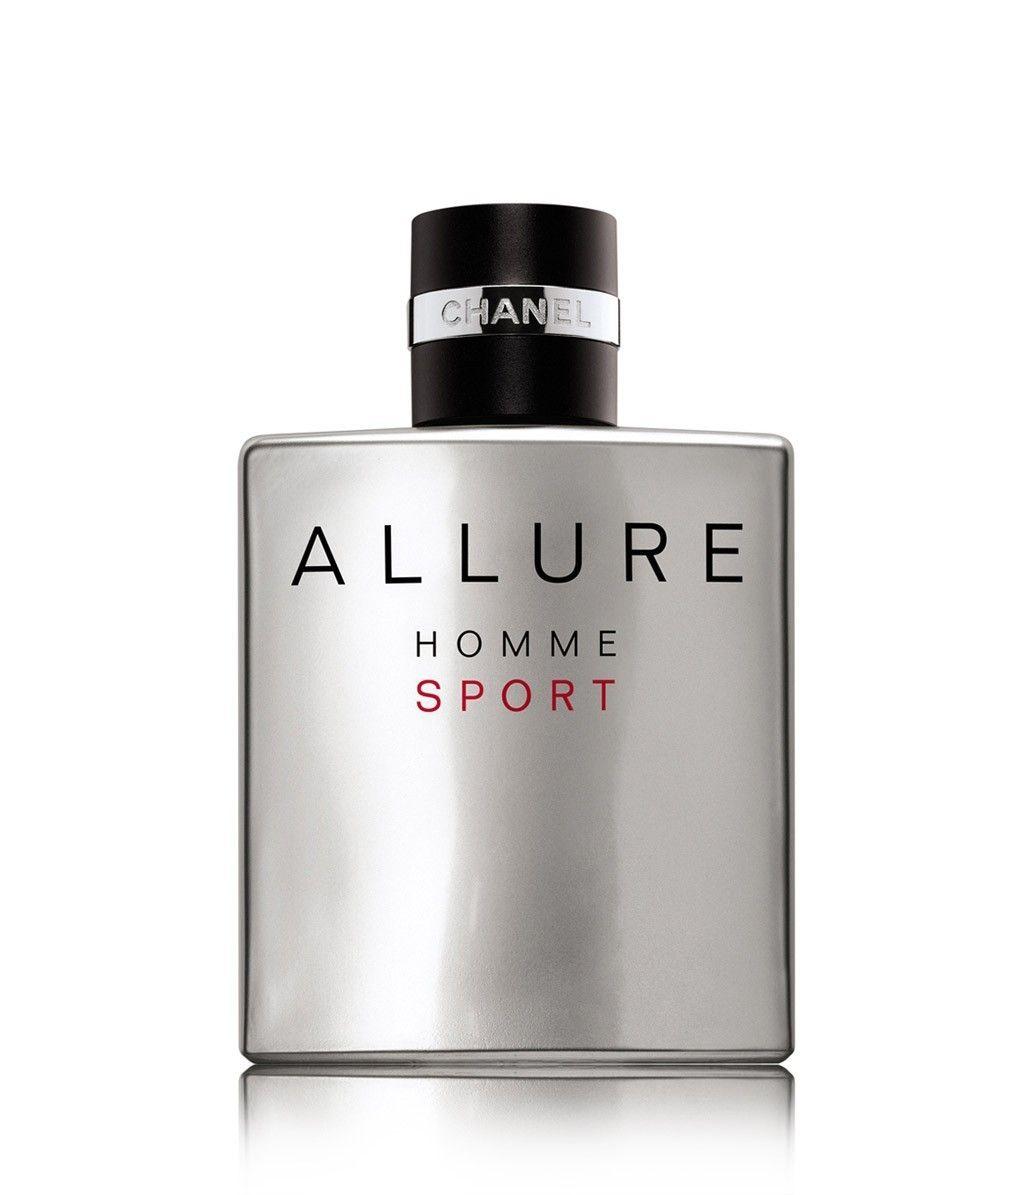 Chanel Allure Homme Sport   PHeROmoNes   Chanel allure homme ... 2e8e08b2cc8